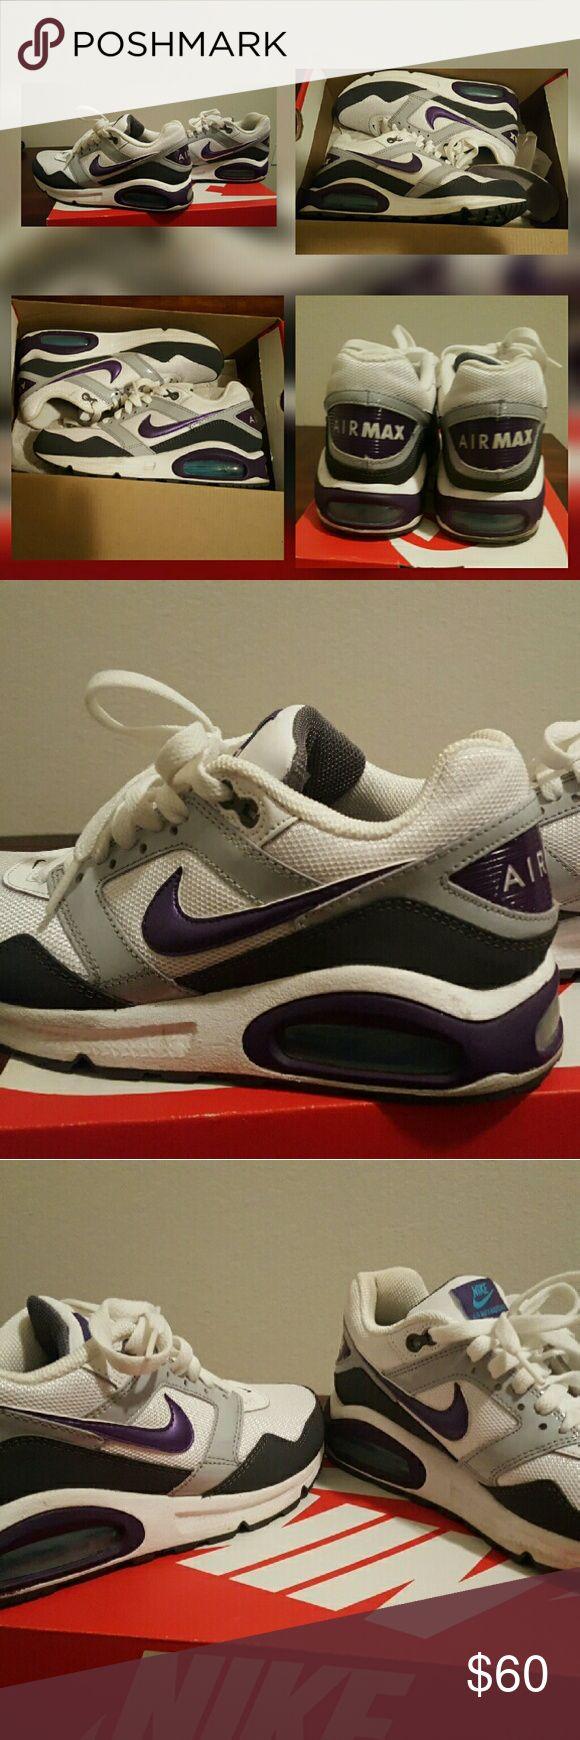 Nike Air Max Ladies Nike Airmax sneakers. Nike Shoes Sneakers